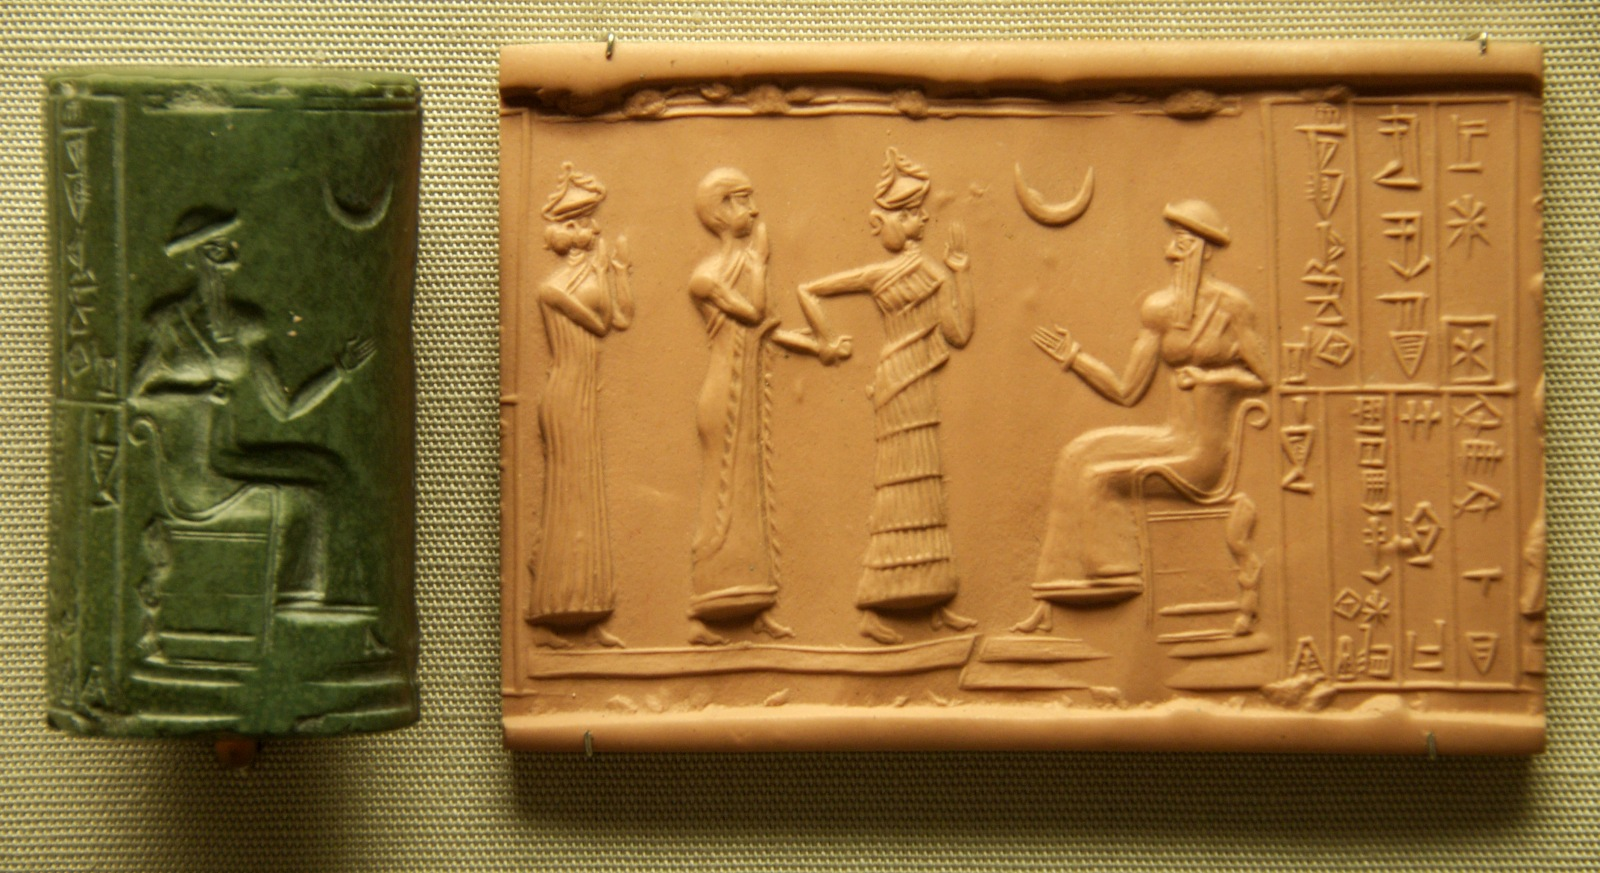 Ficheiro:Sumerian Cylinder Seal of King Ur-Nammu.jpg – Wikipédia, a  enciclopédia livre